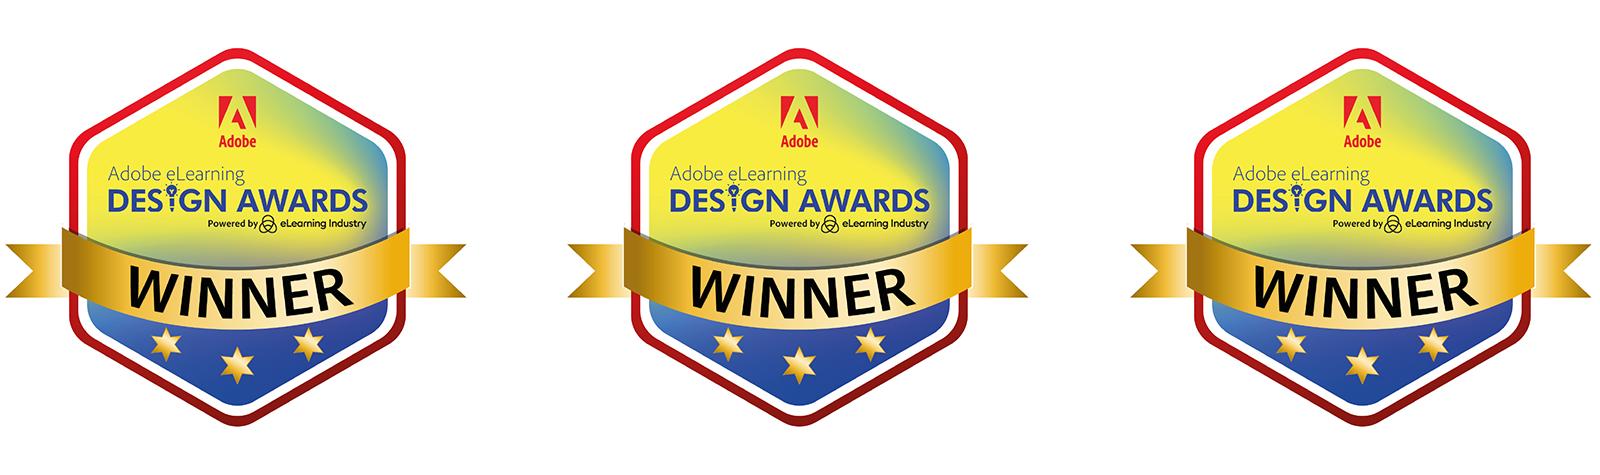 We are WINNERS: Adobe eLearning Design Awards!